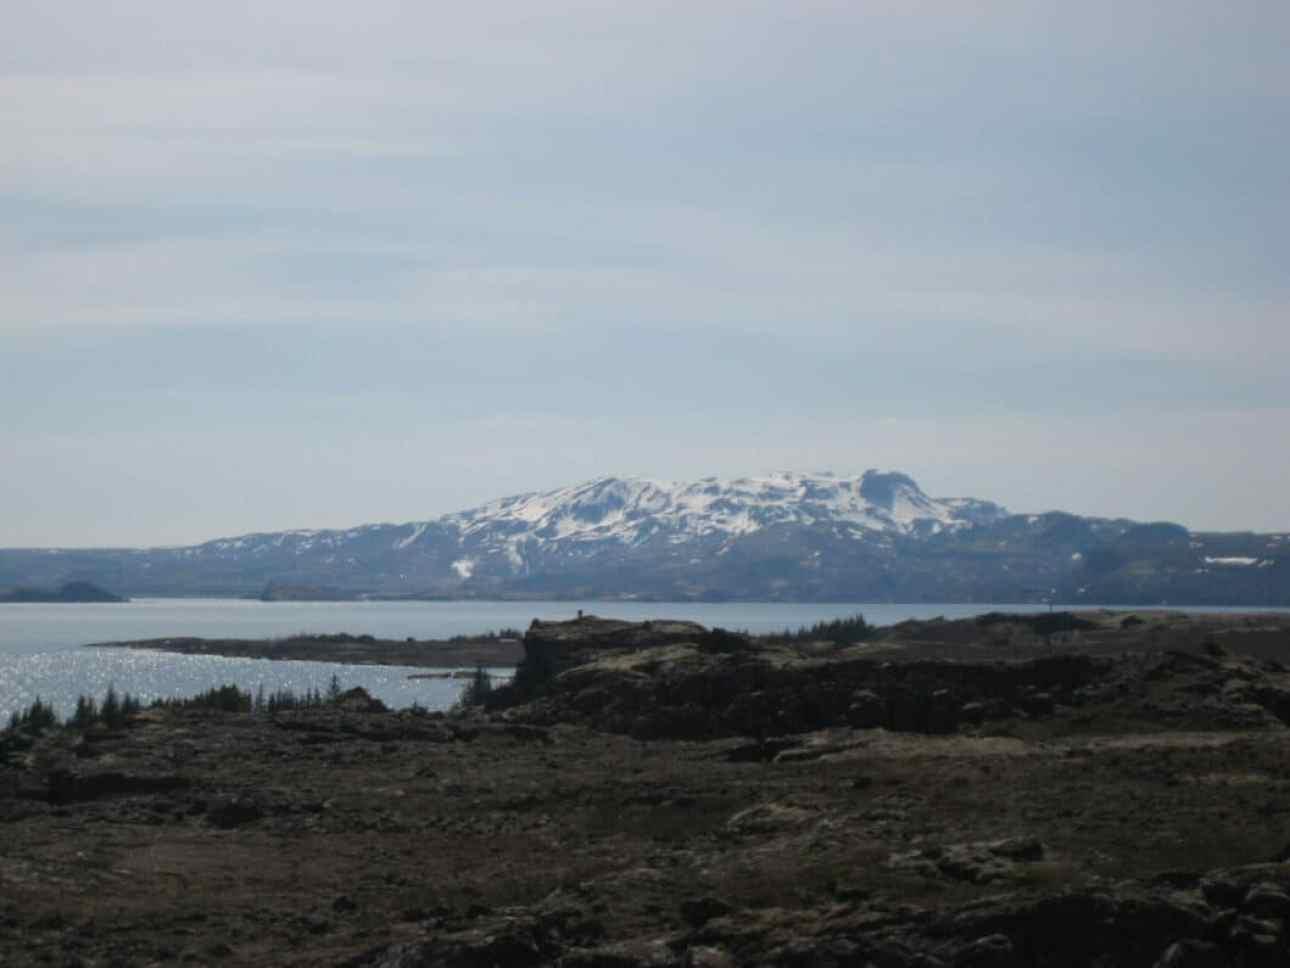 Mountains across the lake at Thingvellir